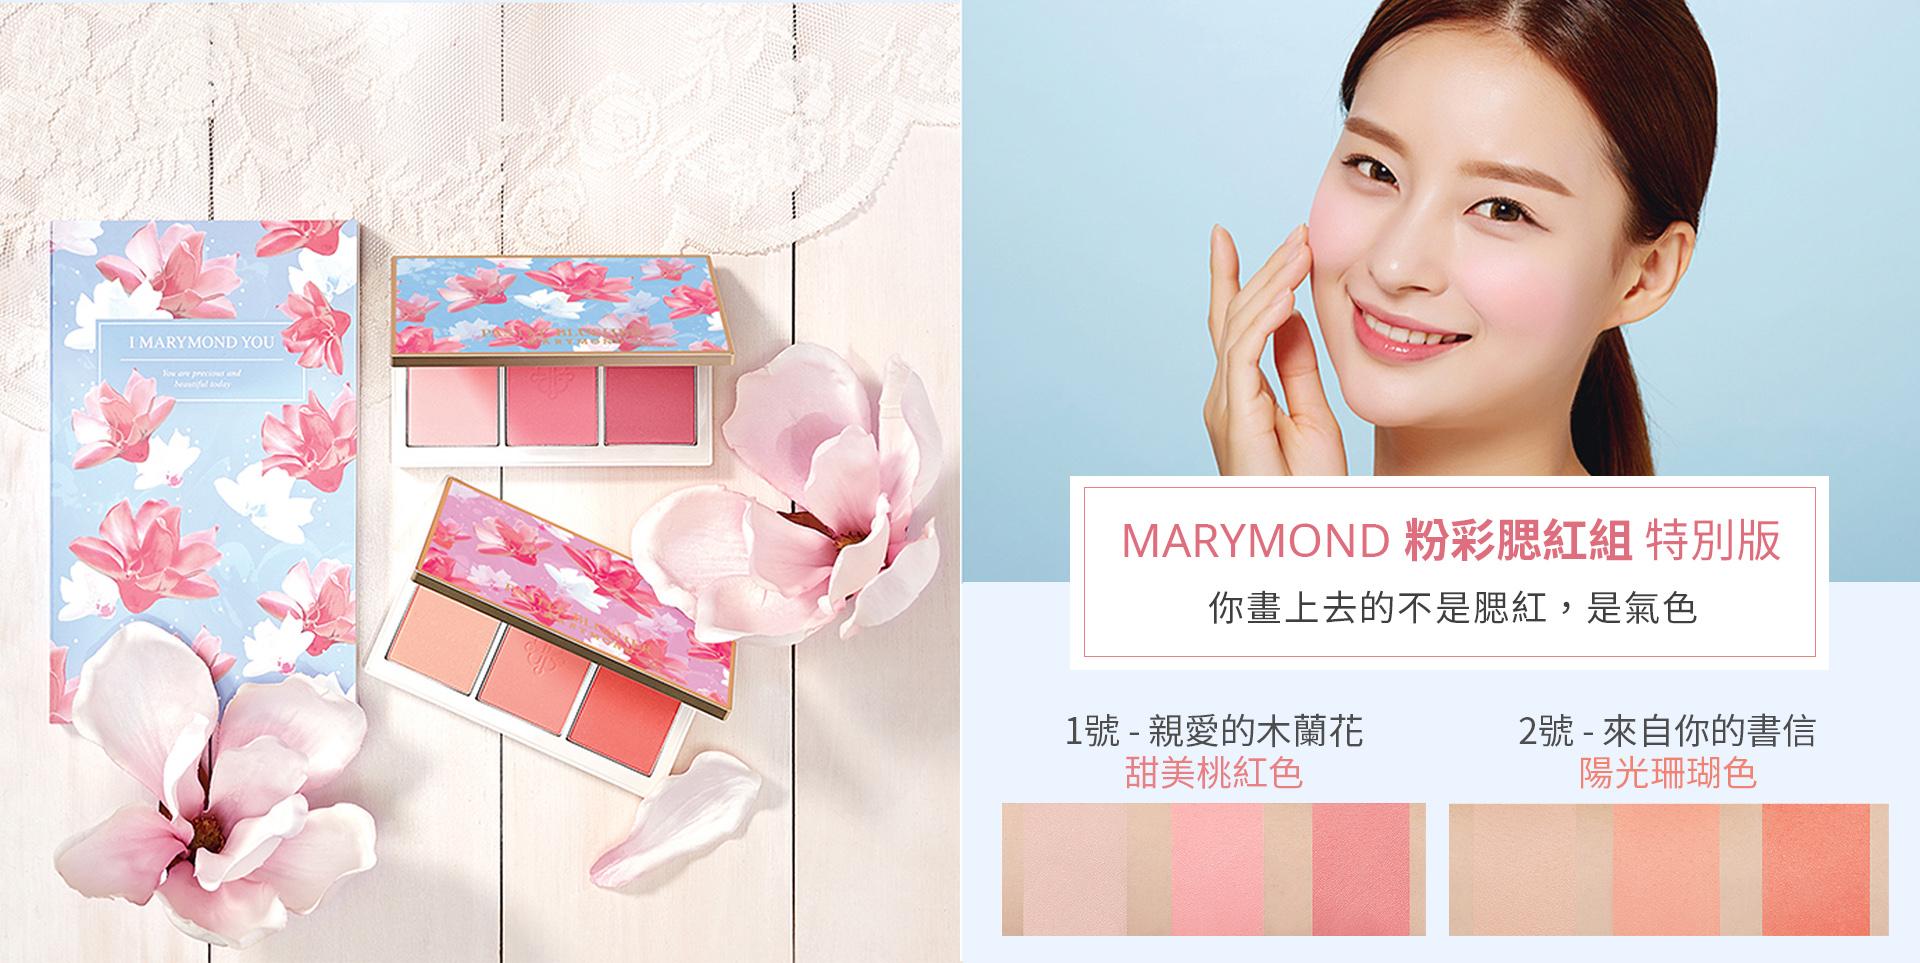 Marymond粉彩腮紅 你擦上去的是氣色